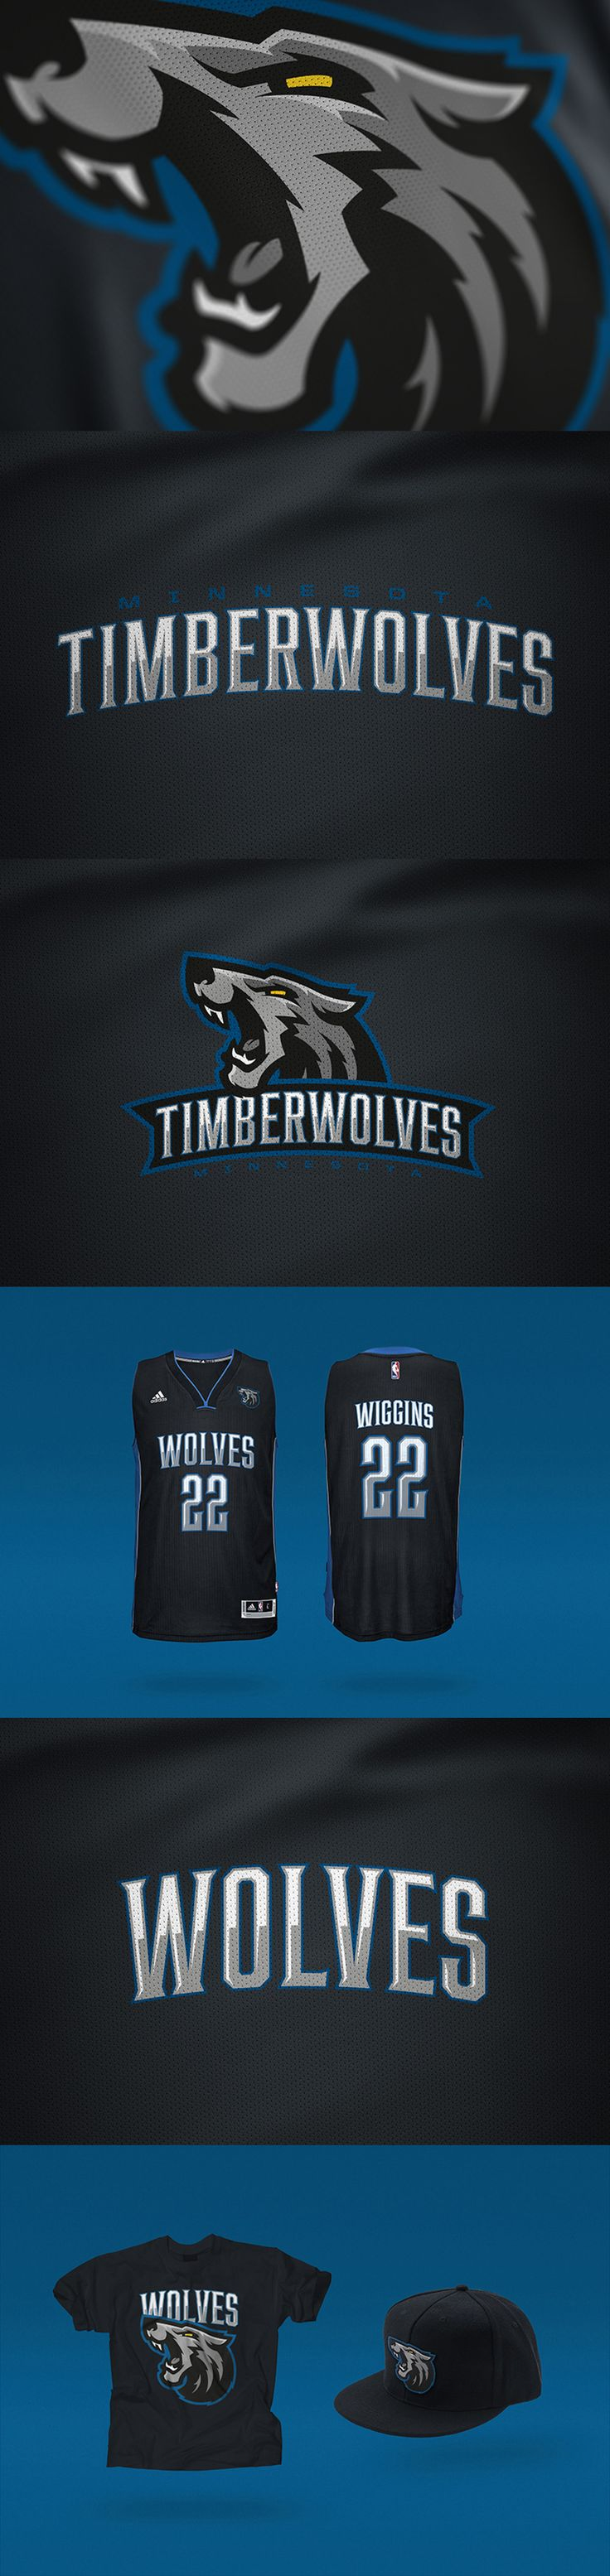 Minnesota Timberwolves Rebrand Concept by Miika Kumpulainen